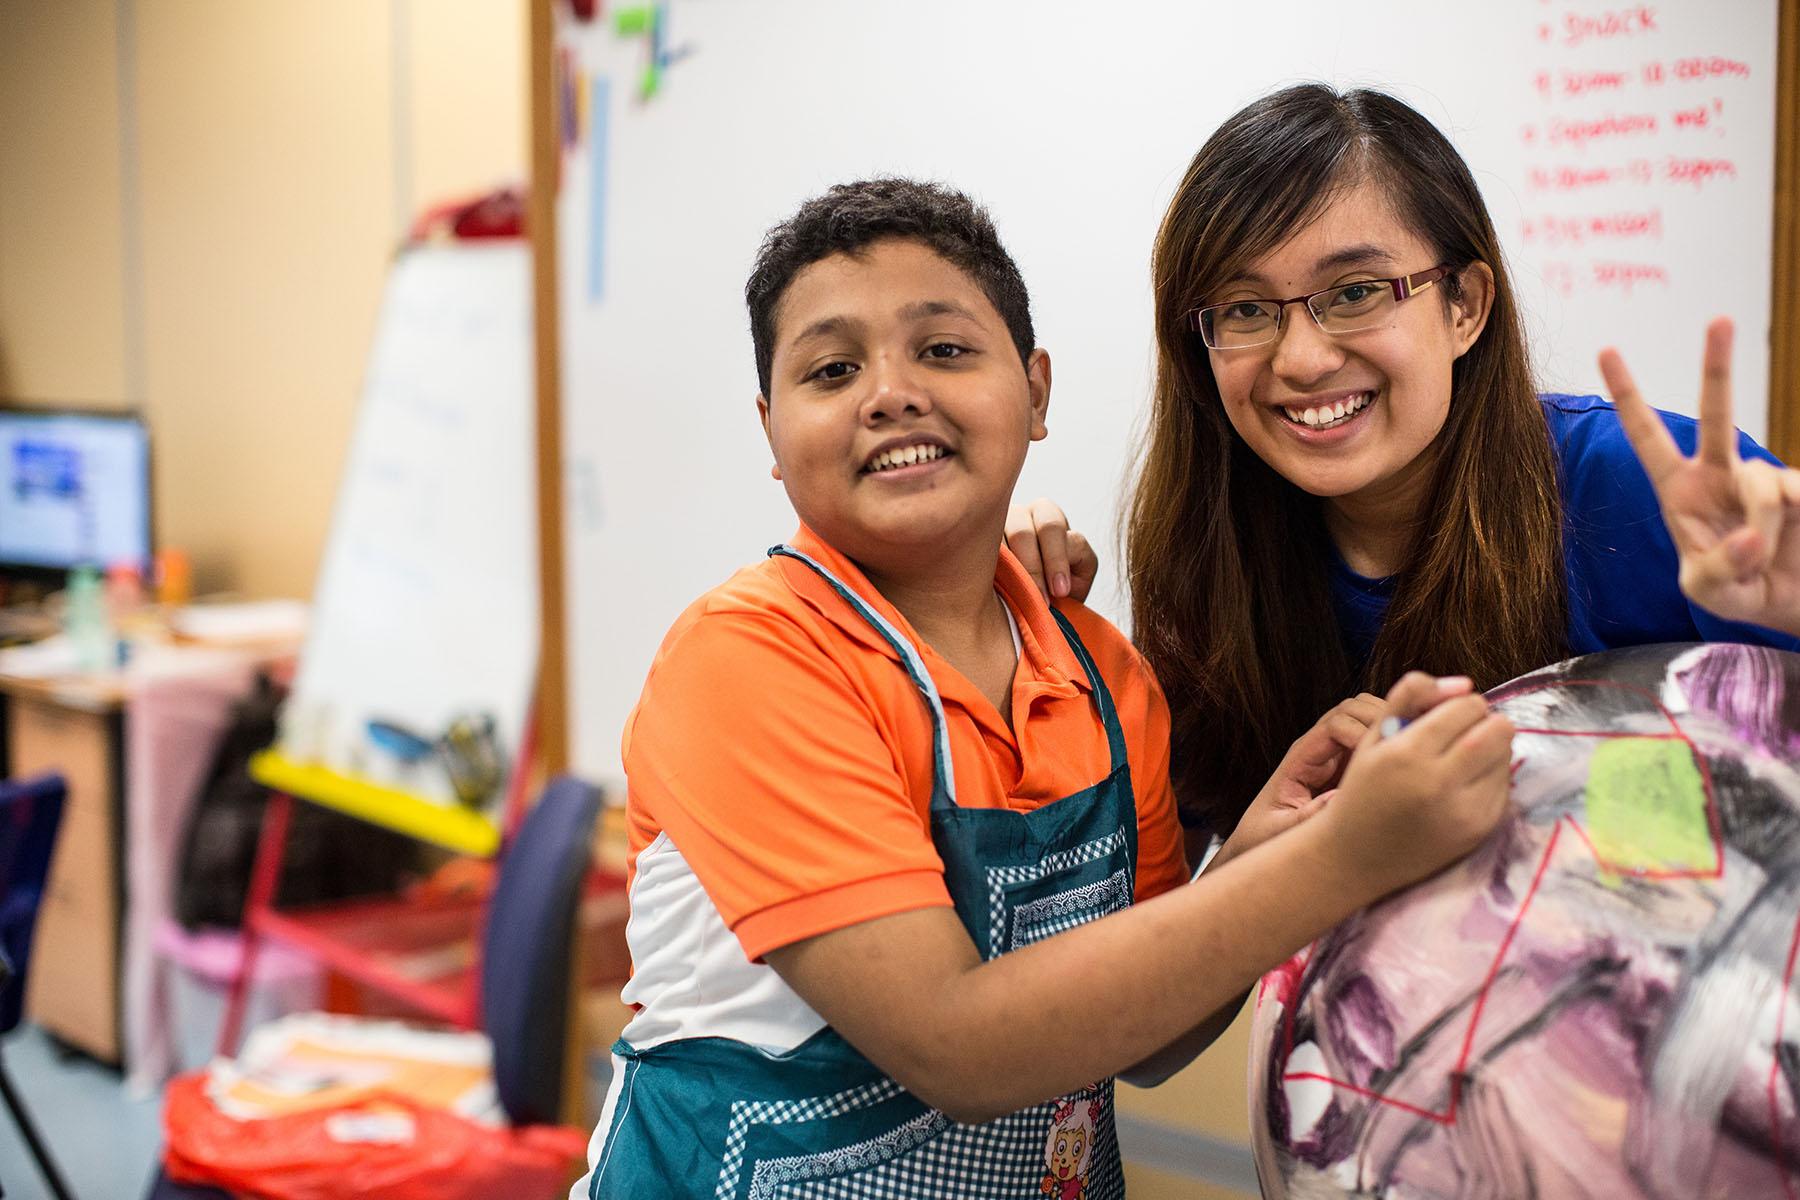 Childrens Charities Association 02